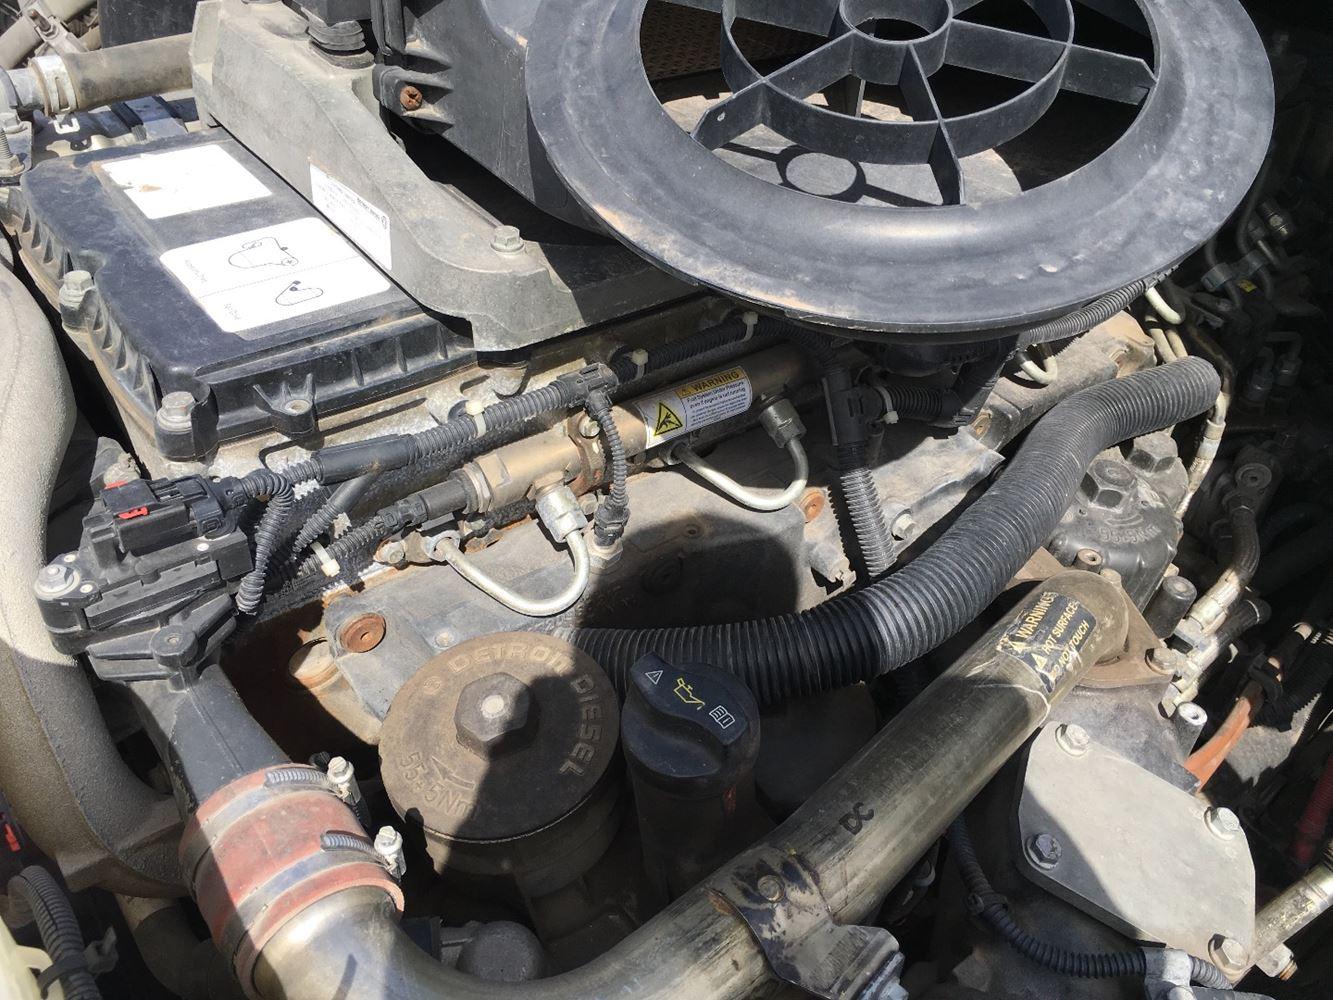 2011 Detroit DD15 (Stock #SV-1744-1)   Engine Assys   TPI